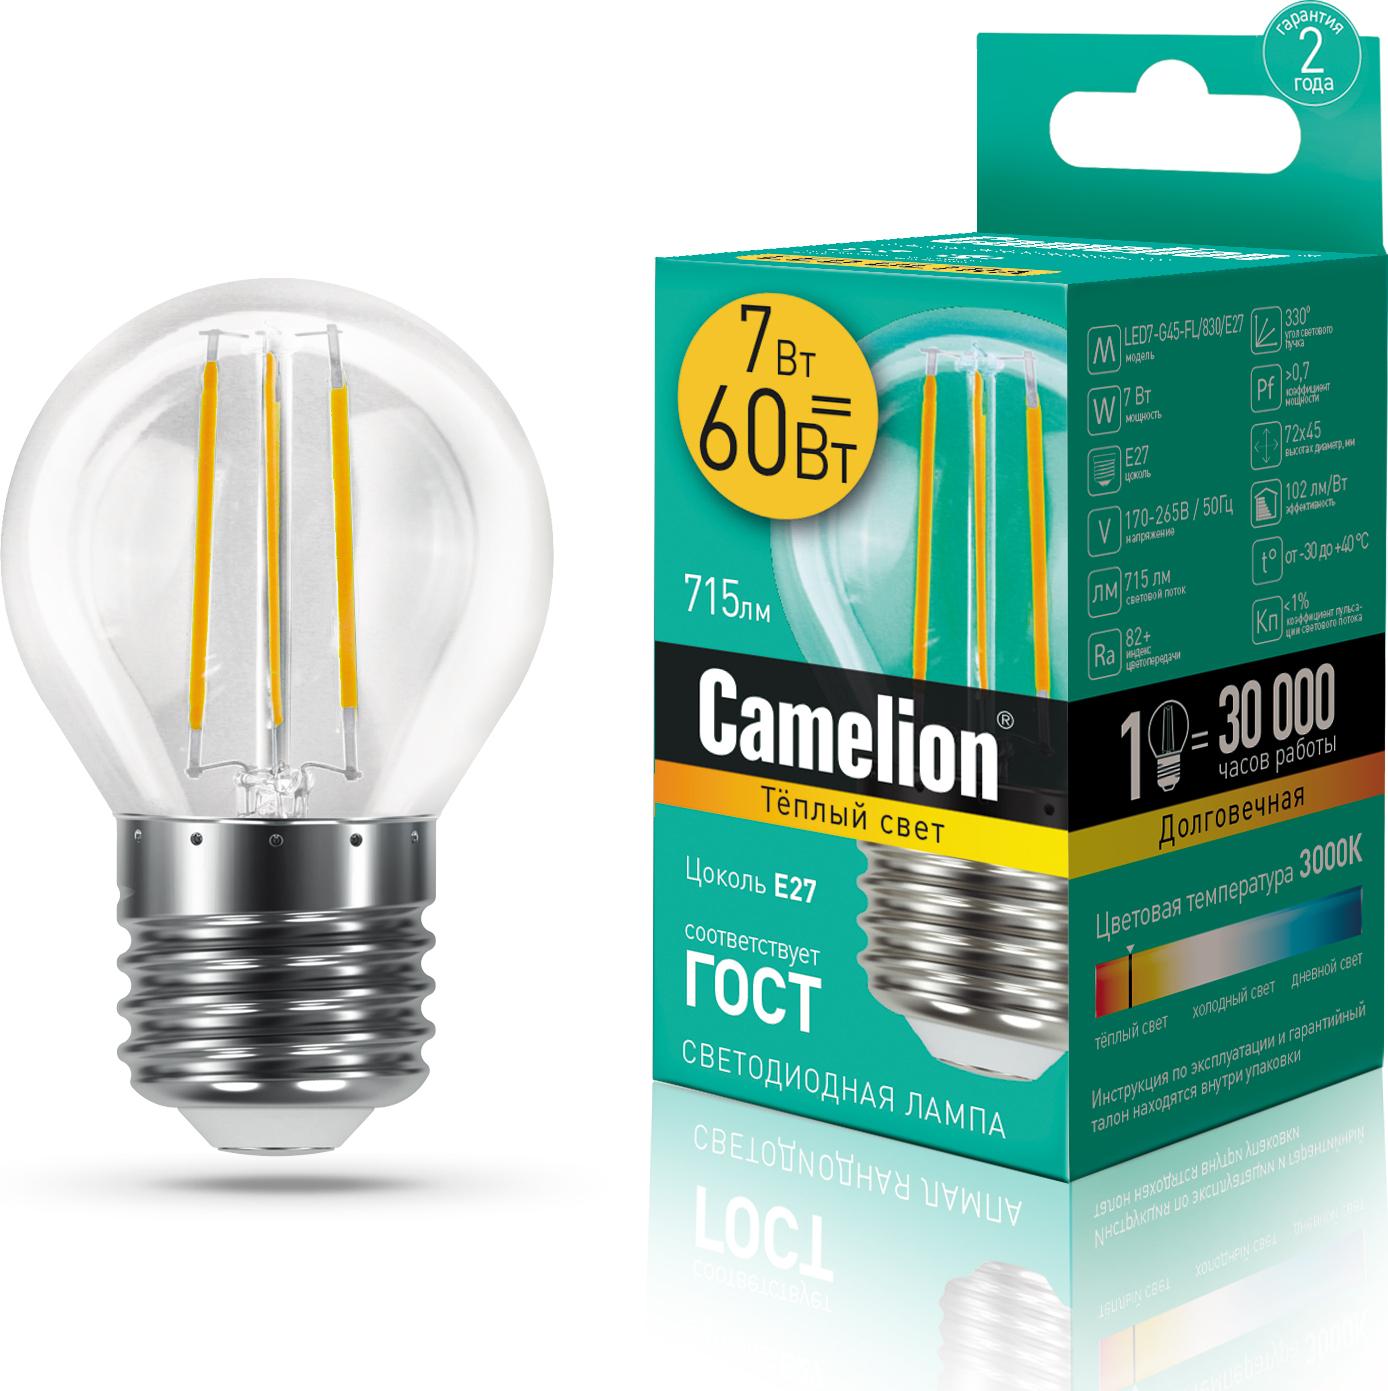 Лампа Camelion LED7-G45-FL/830/E27